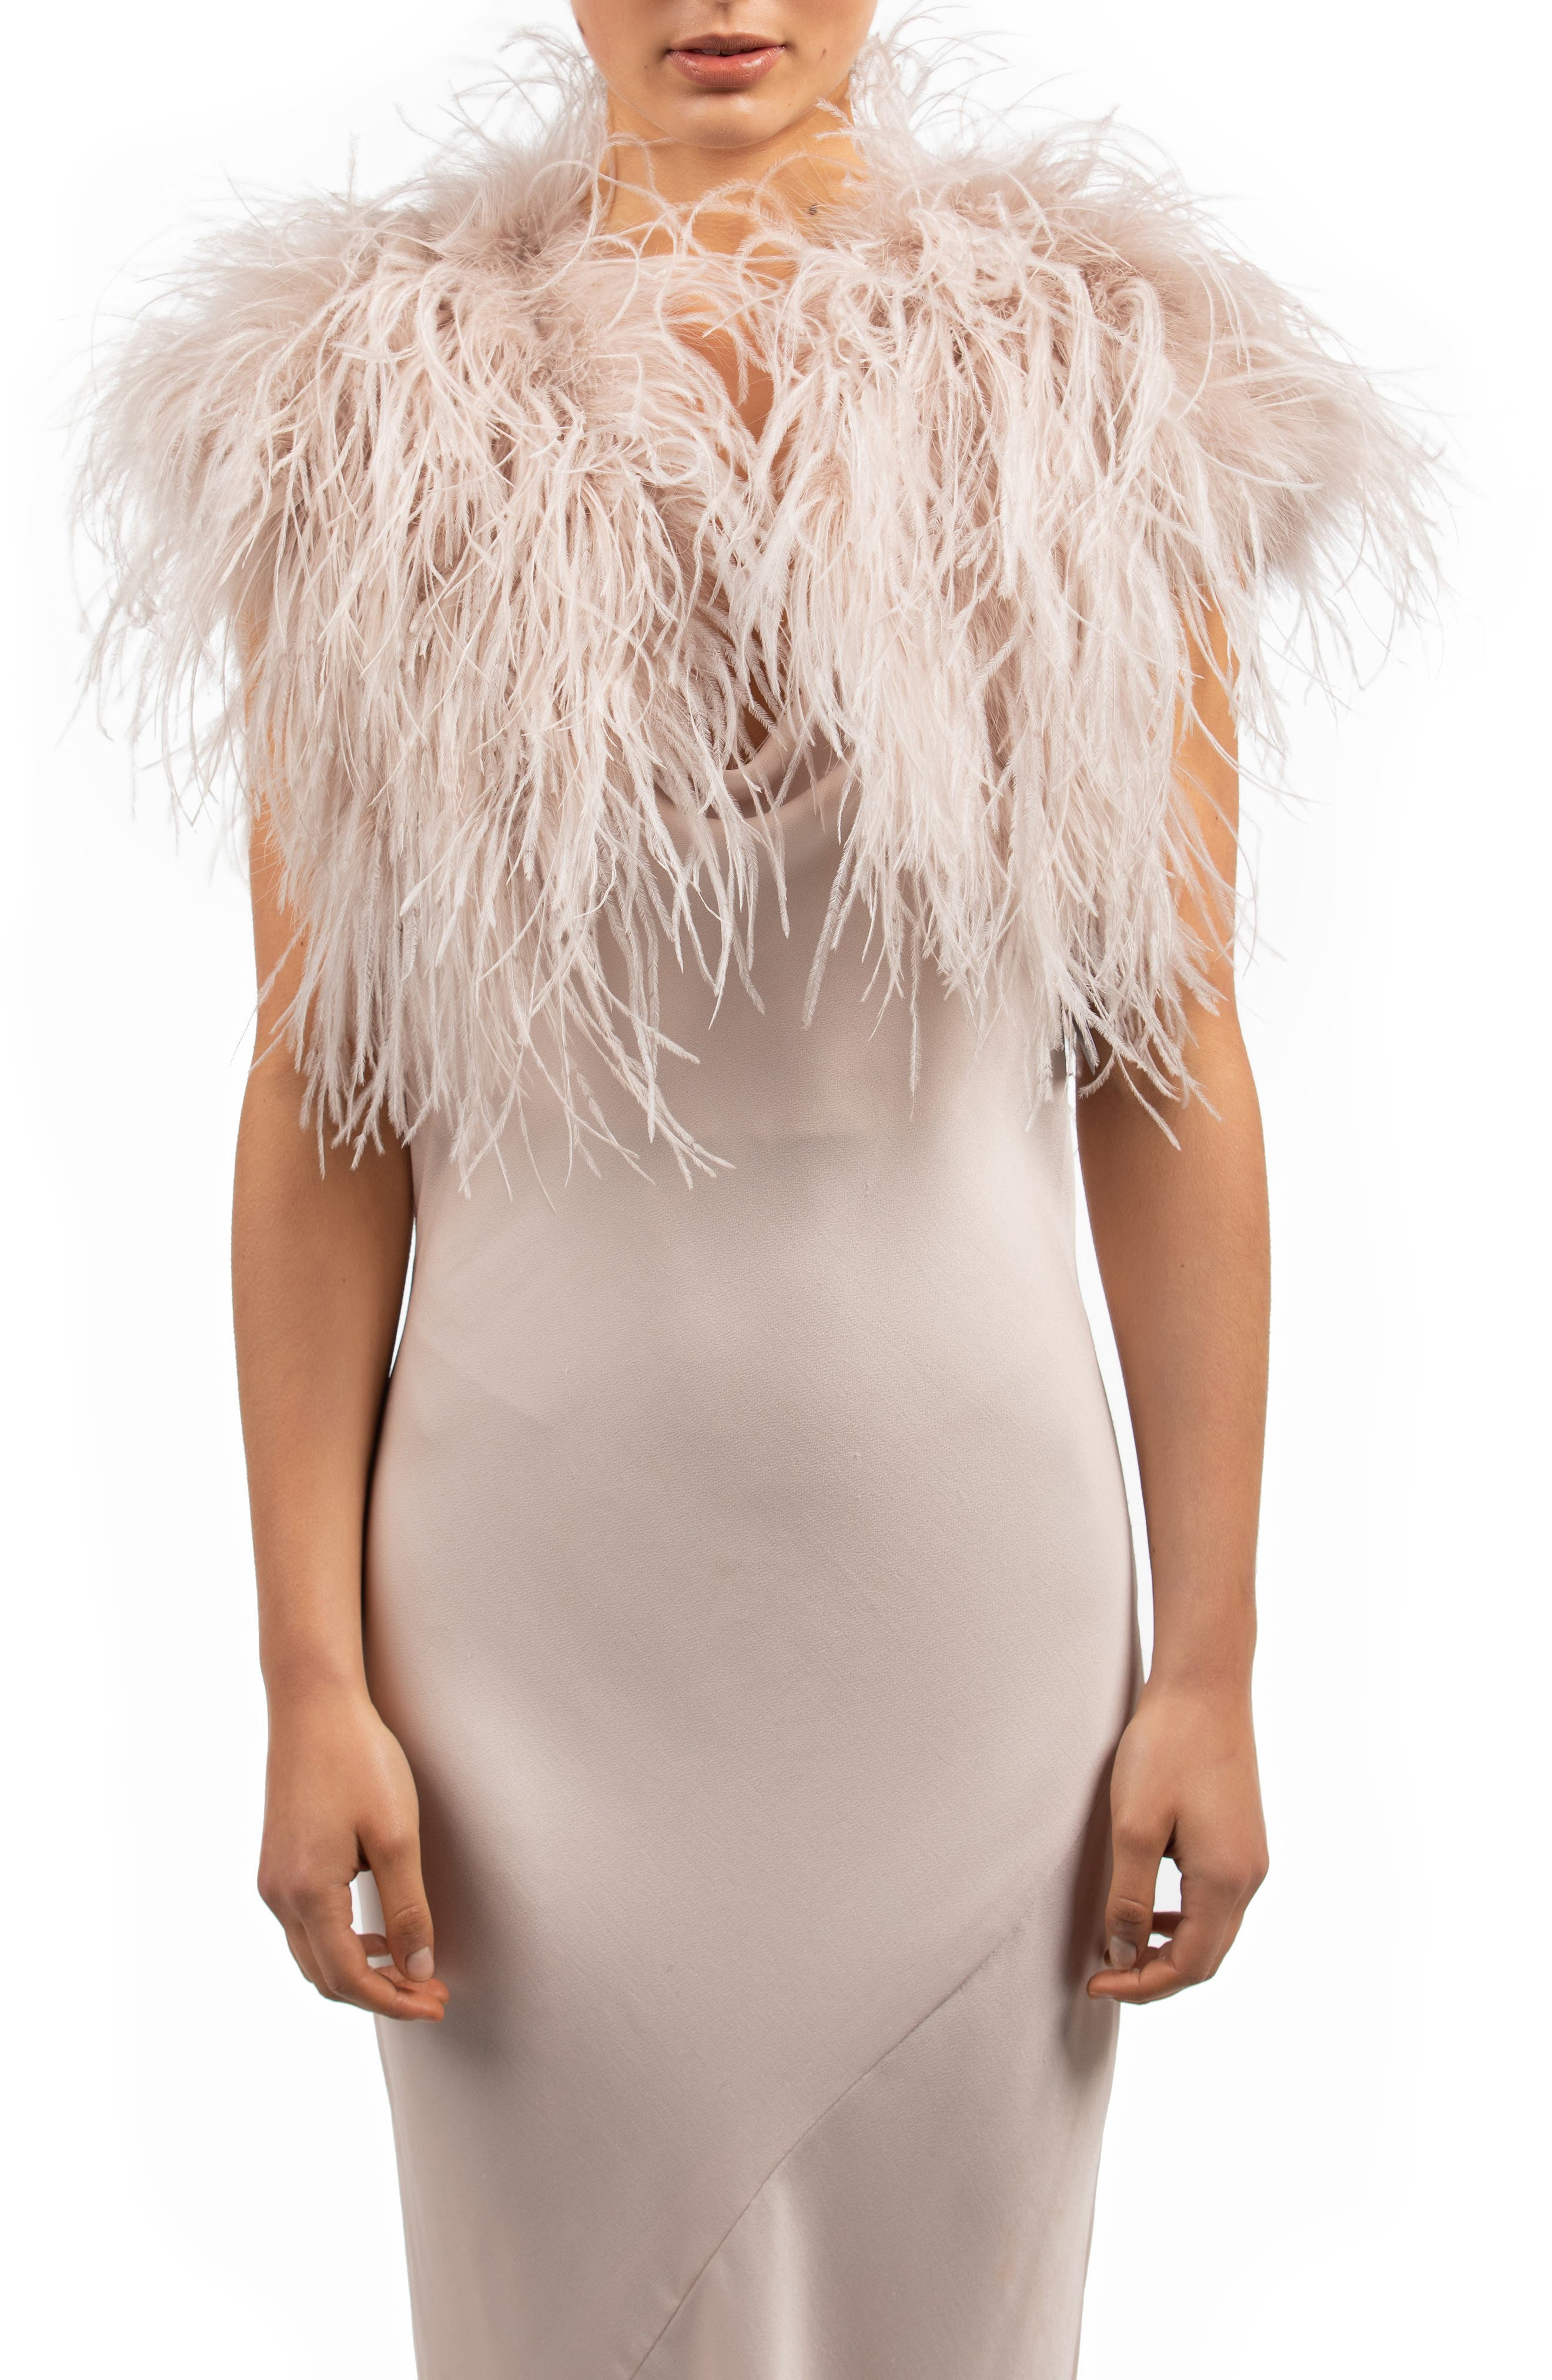 1920s Shawls, Wraps, Scarves, Fur Stole Womens Bubish Berlin Ostrich Feather Bolero Size MediumLarge - Pink $399.00 AT vintagedancer.com